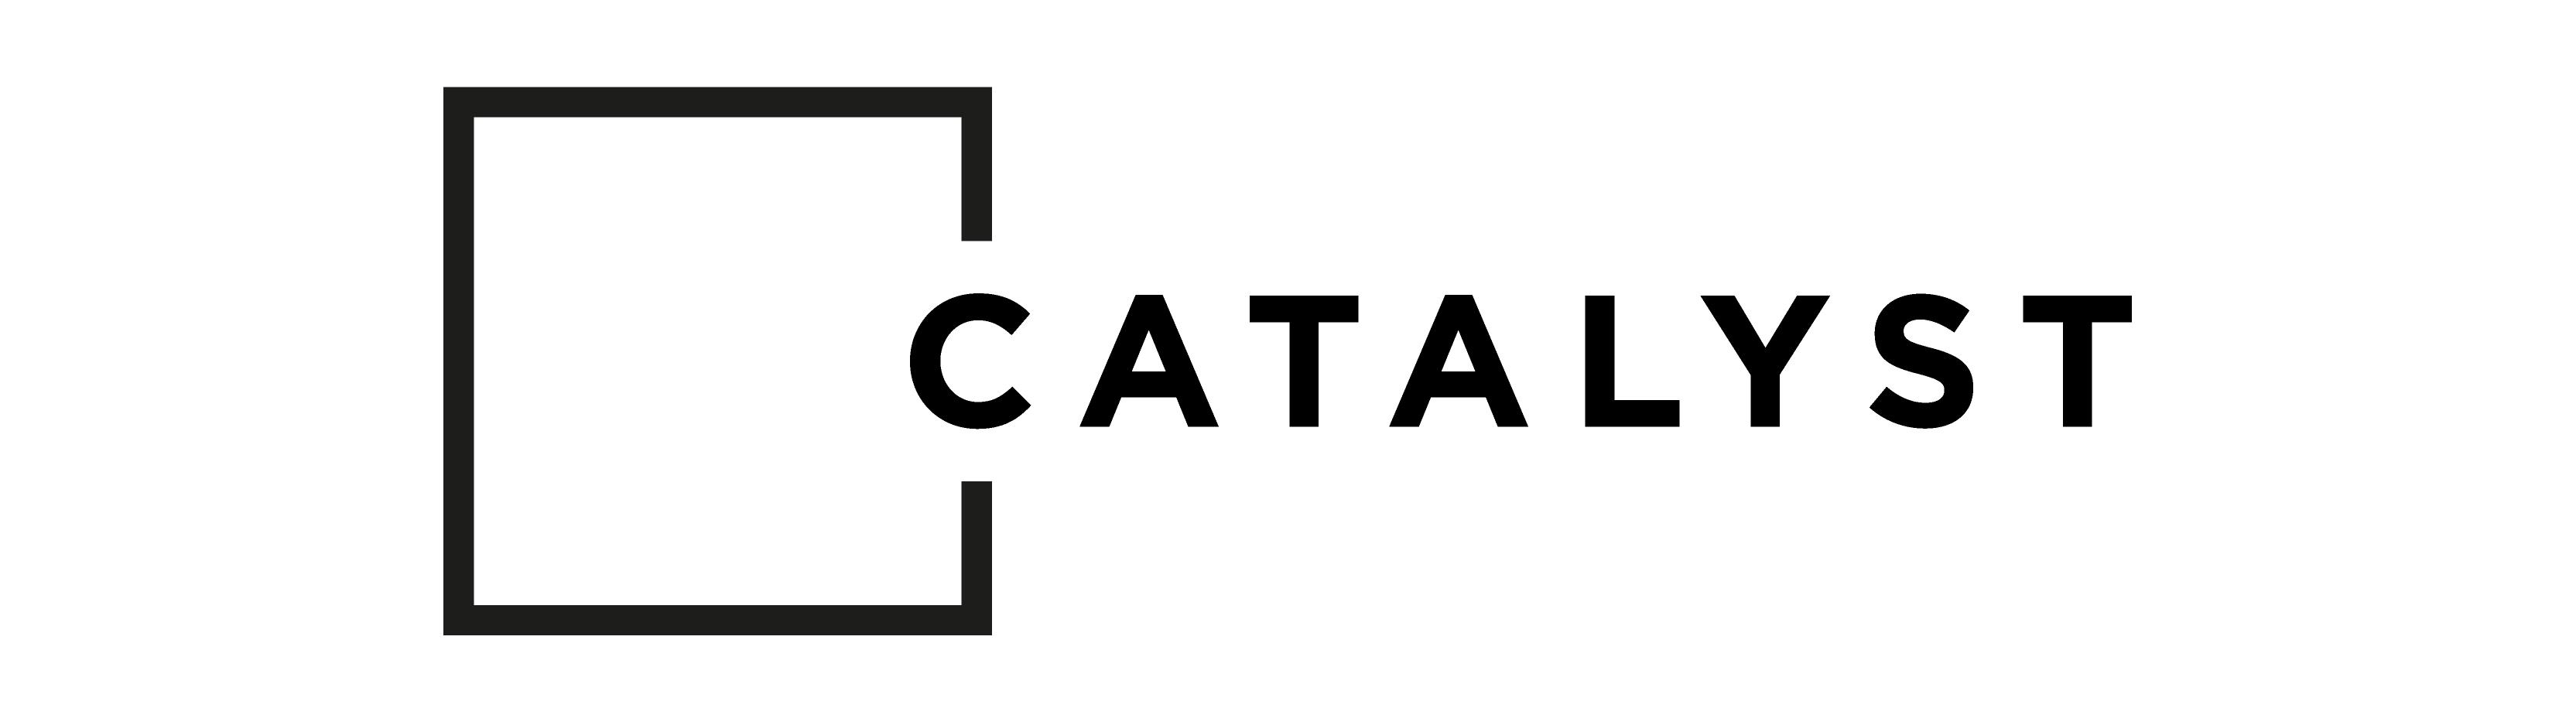 Viscom Catalyst